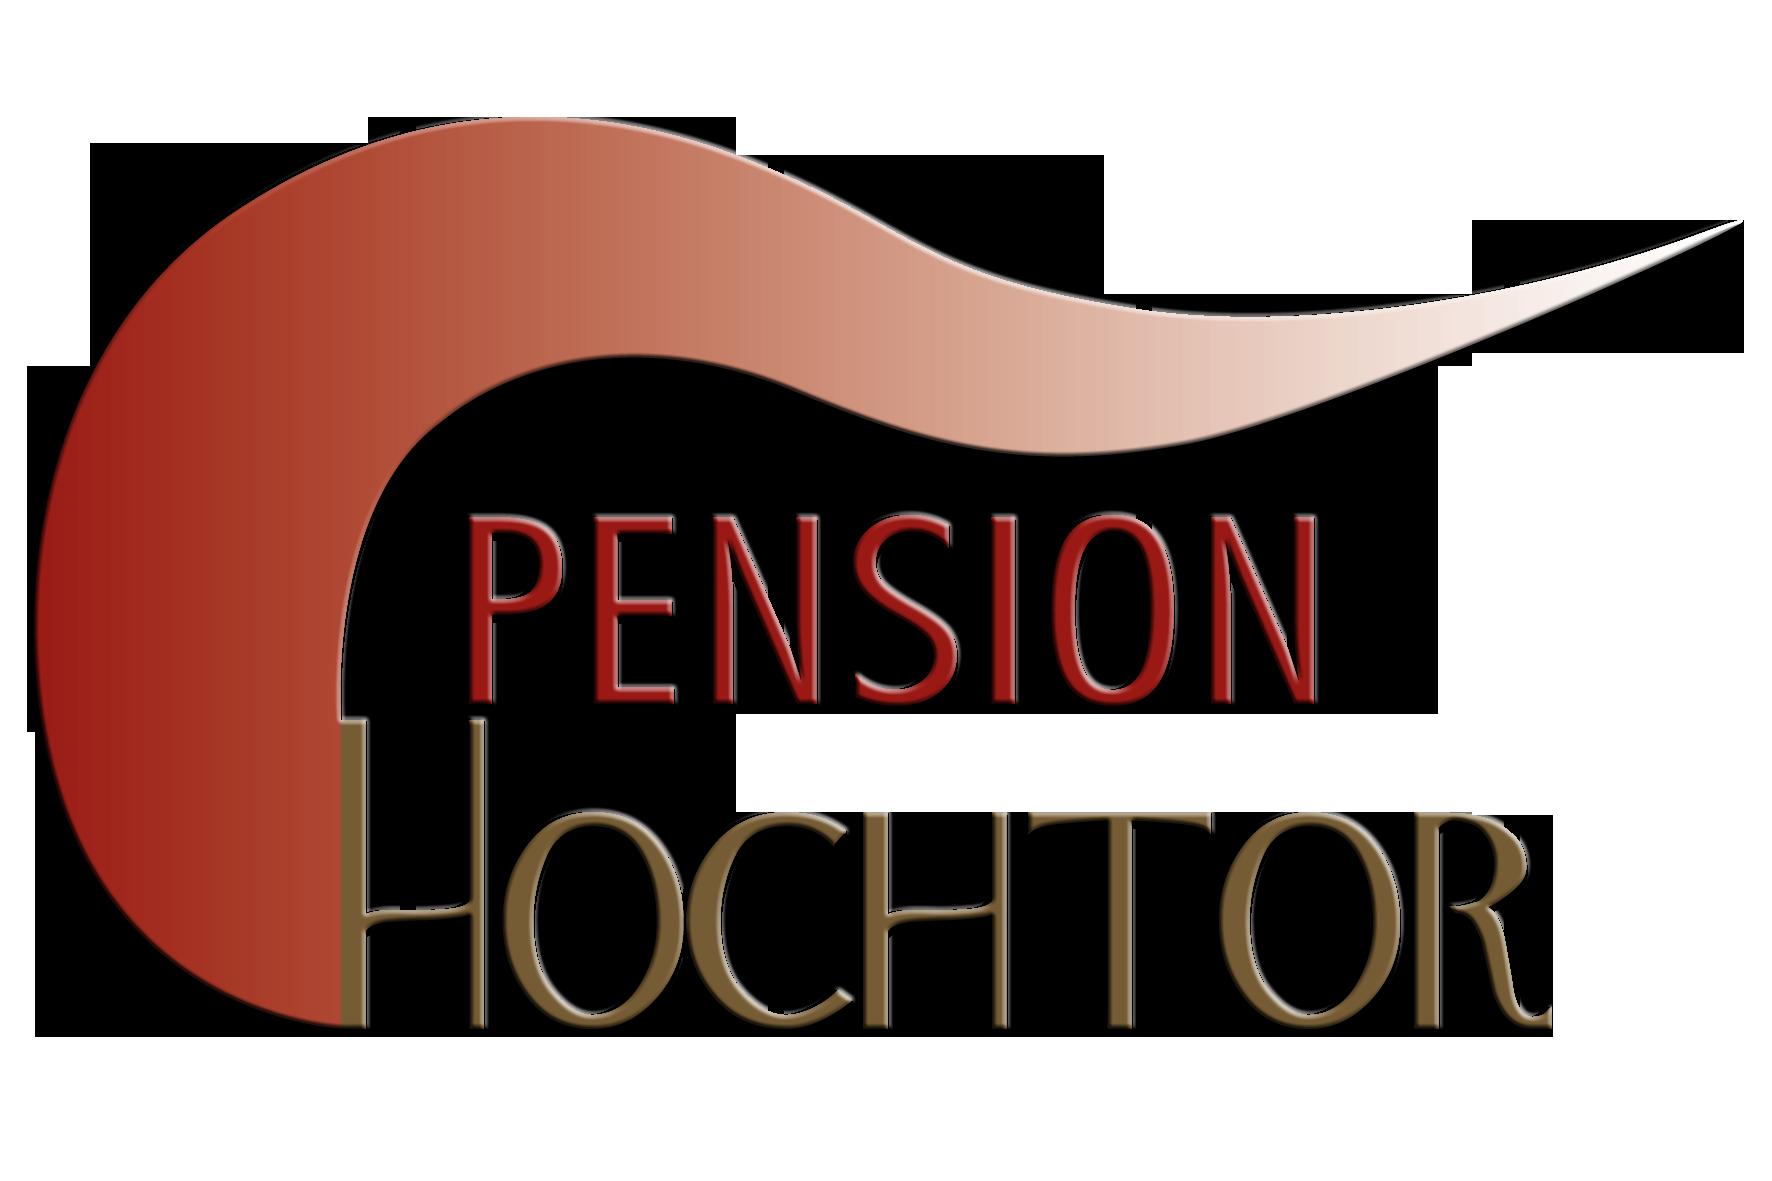 hochtor_logo_18.01.16 Kopie